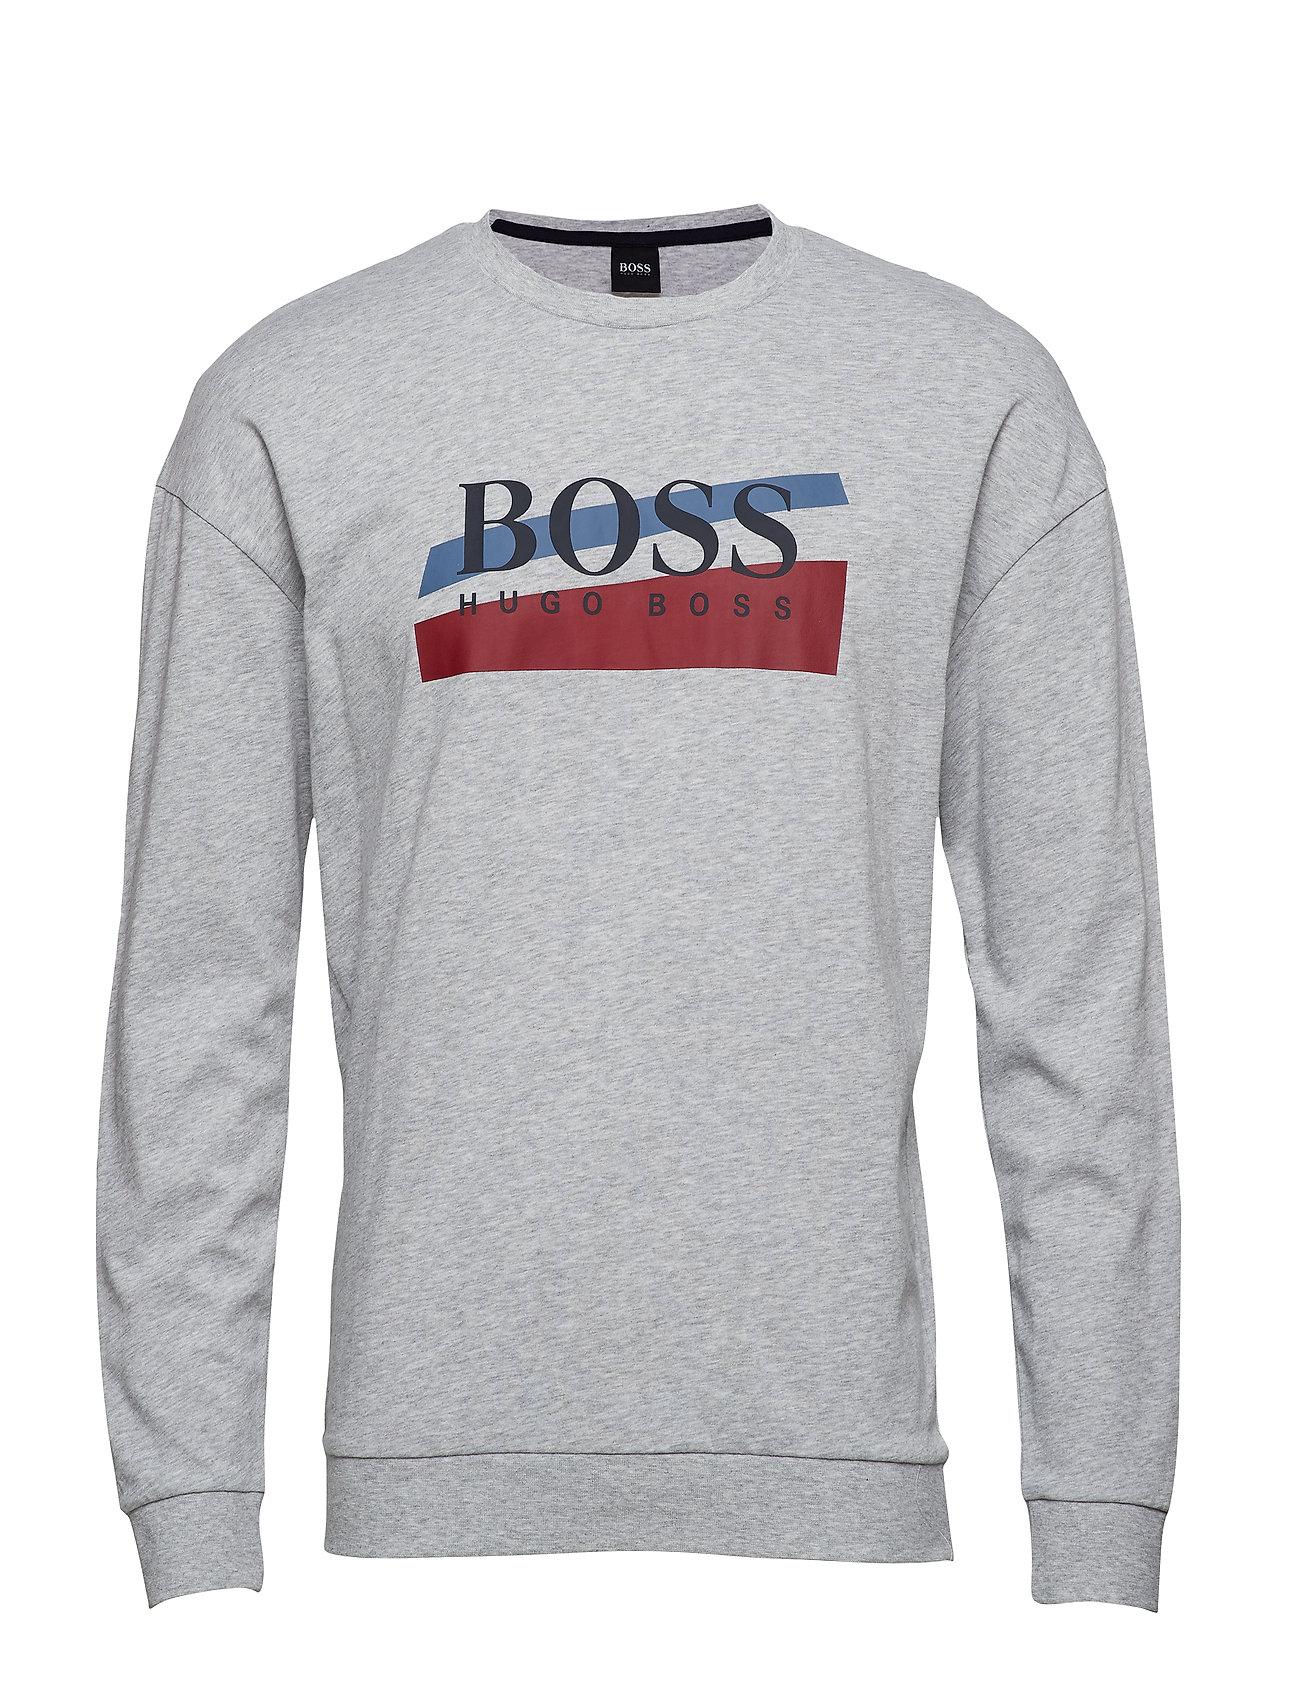 BOSS Business Wear Authentic Sweatshirt - MEDIUM GREY